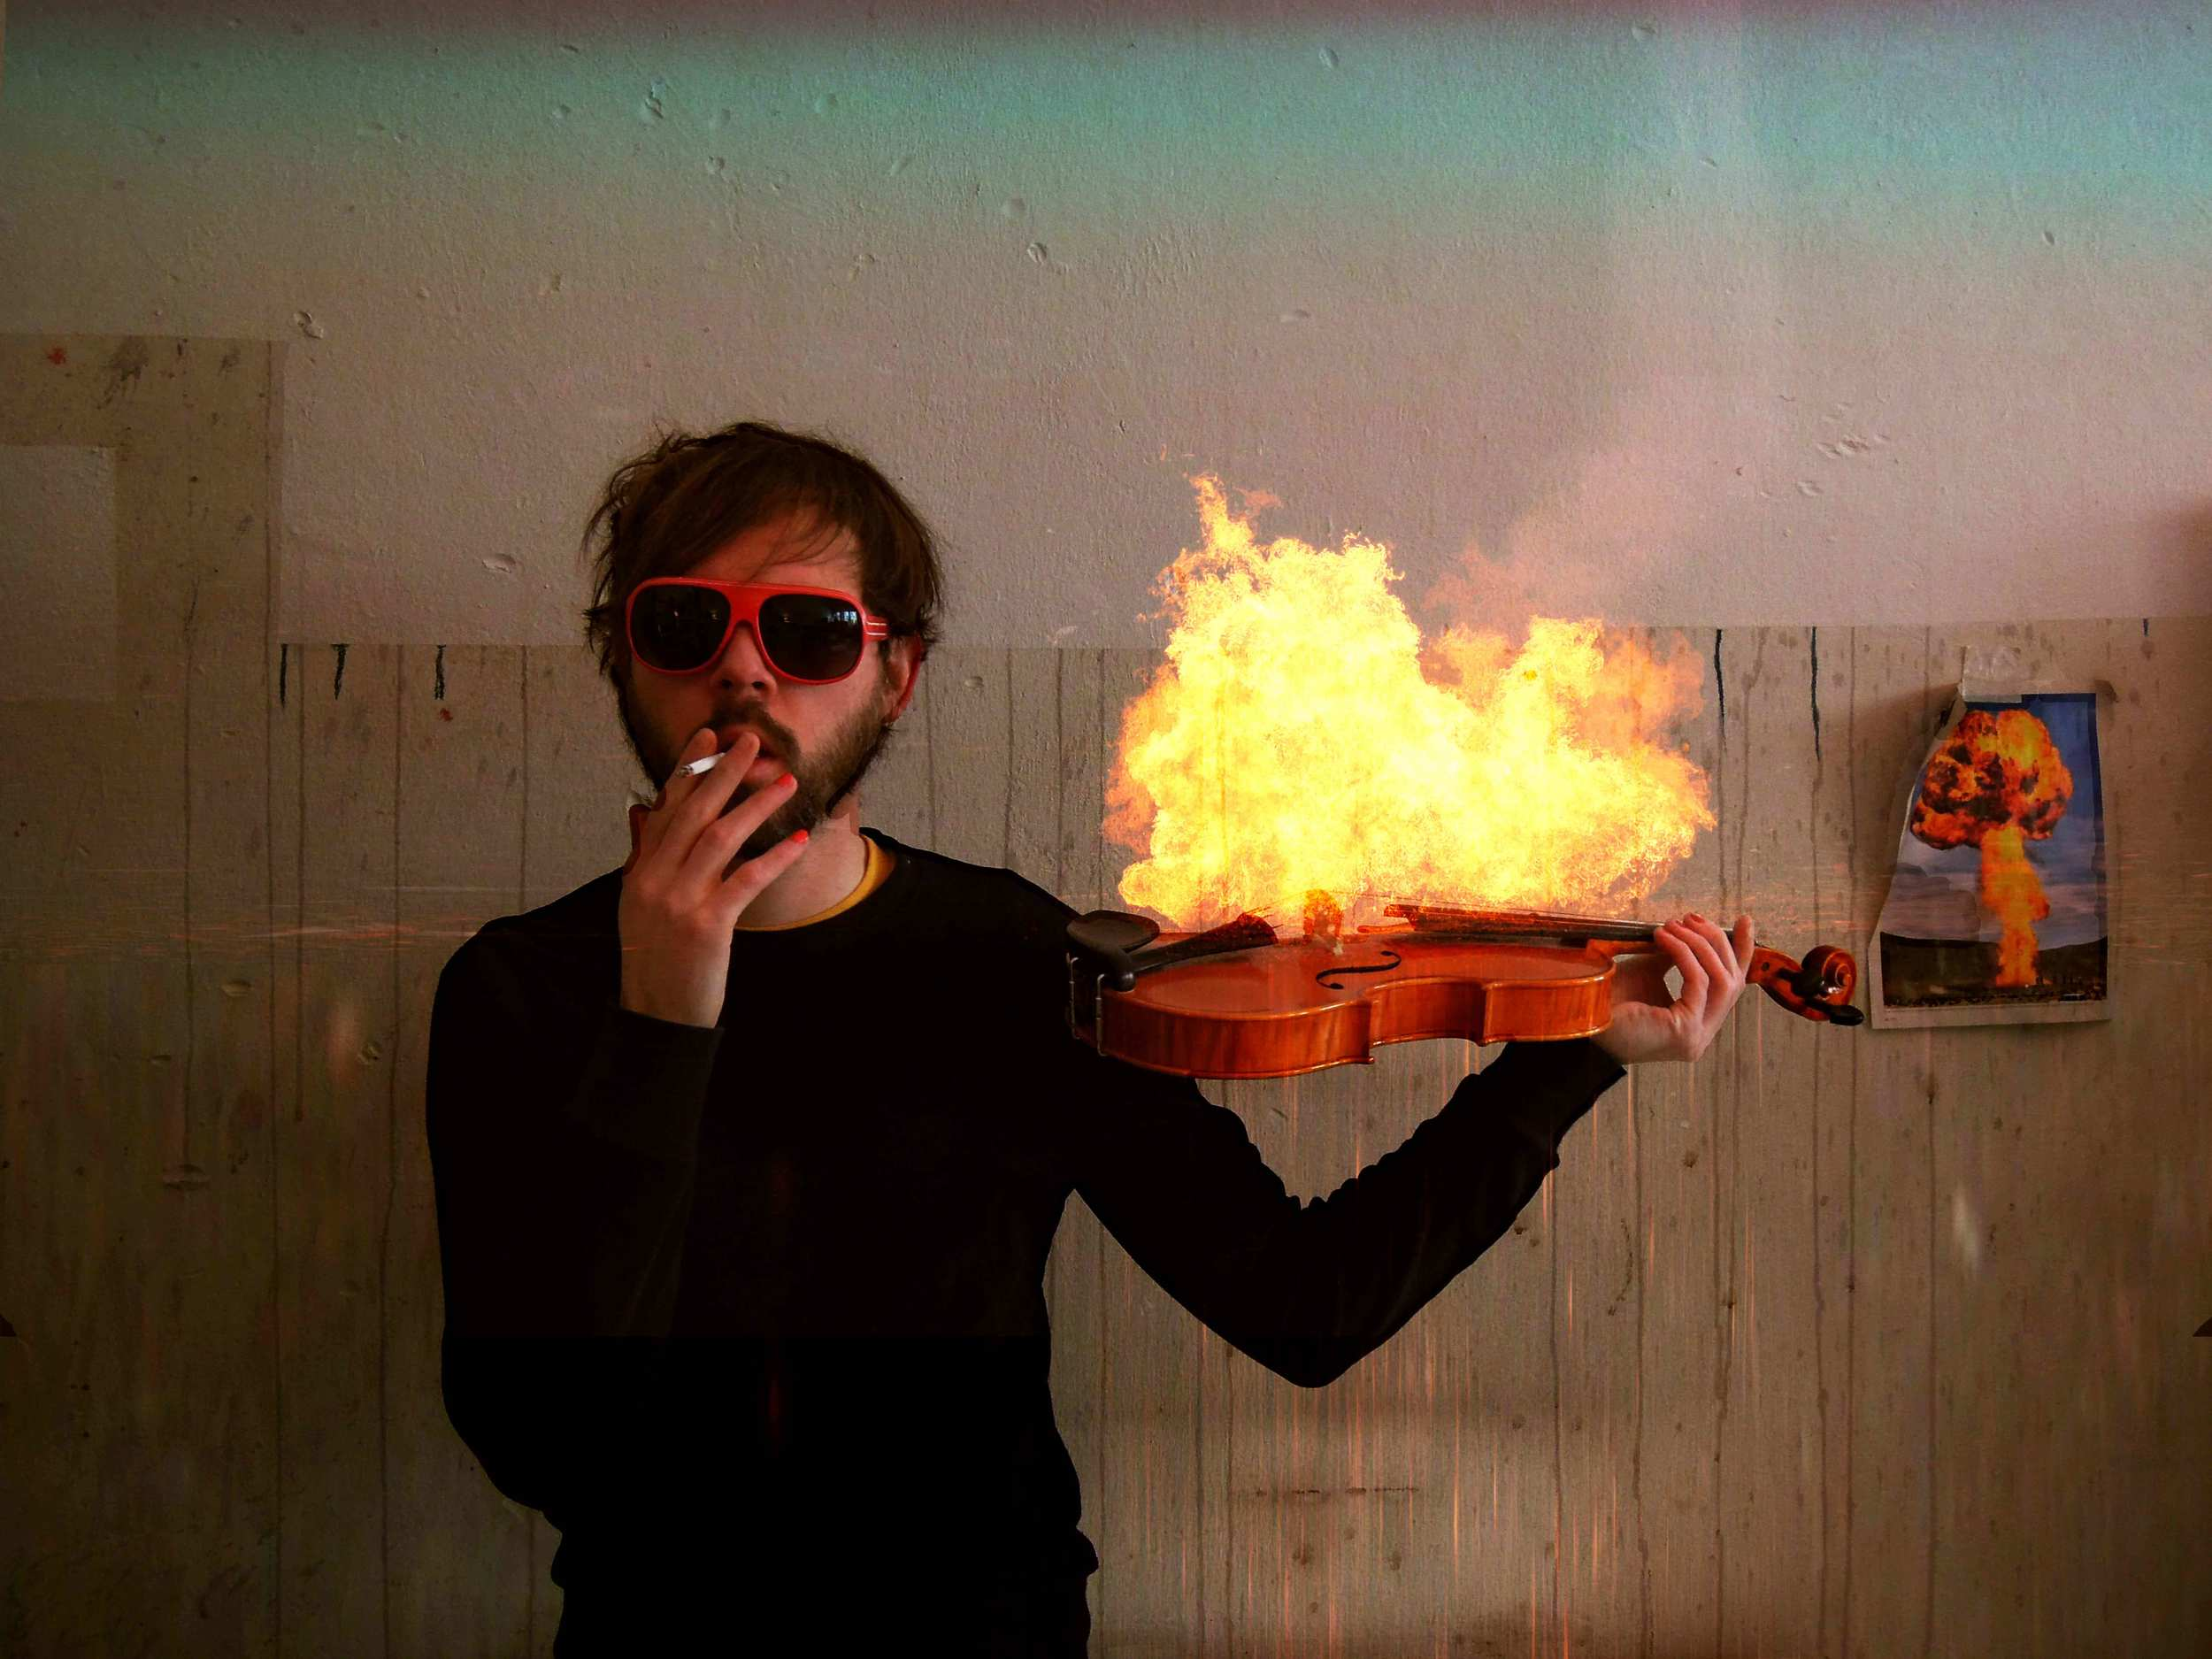 alexander_schubert_violin.jpg